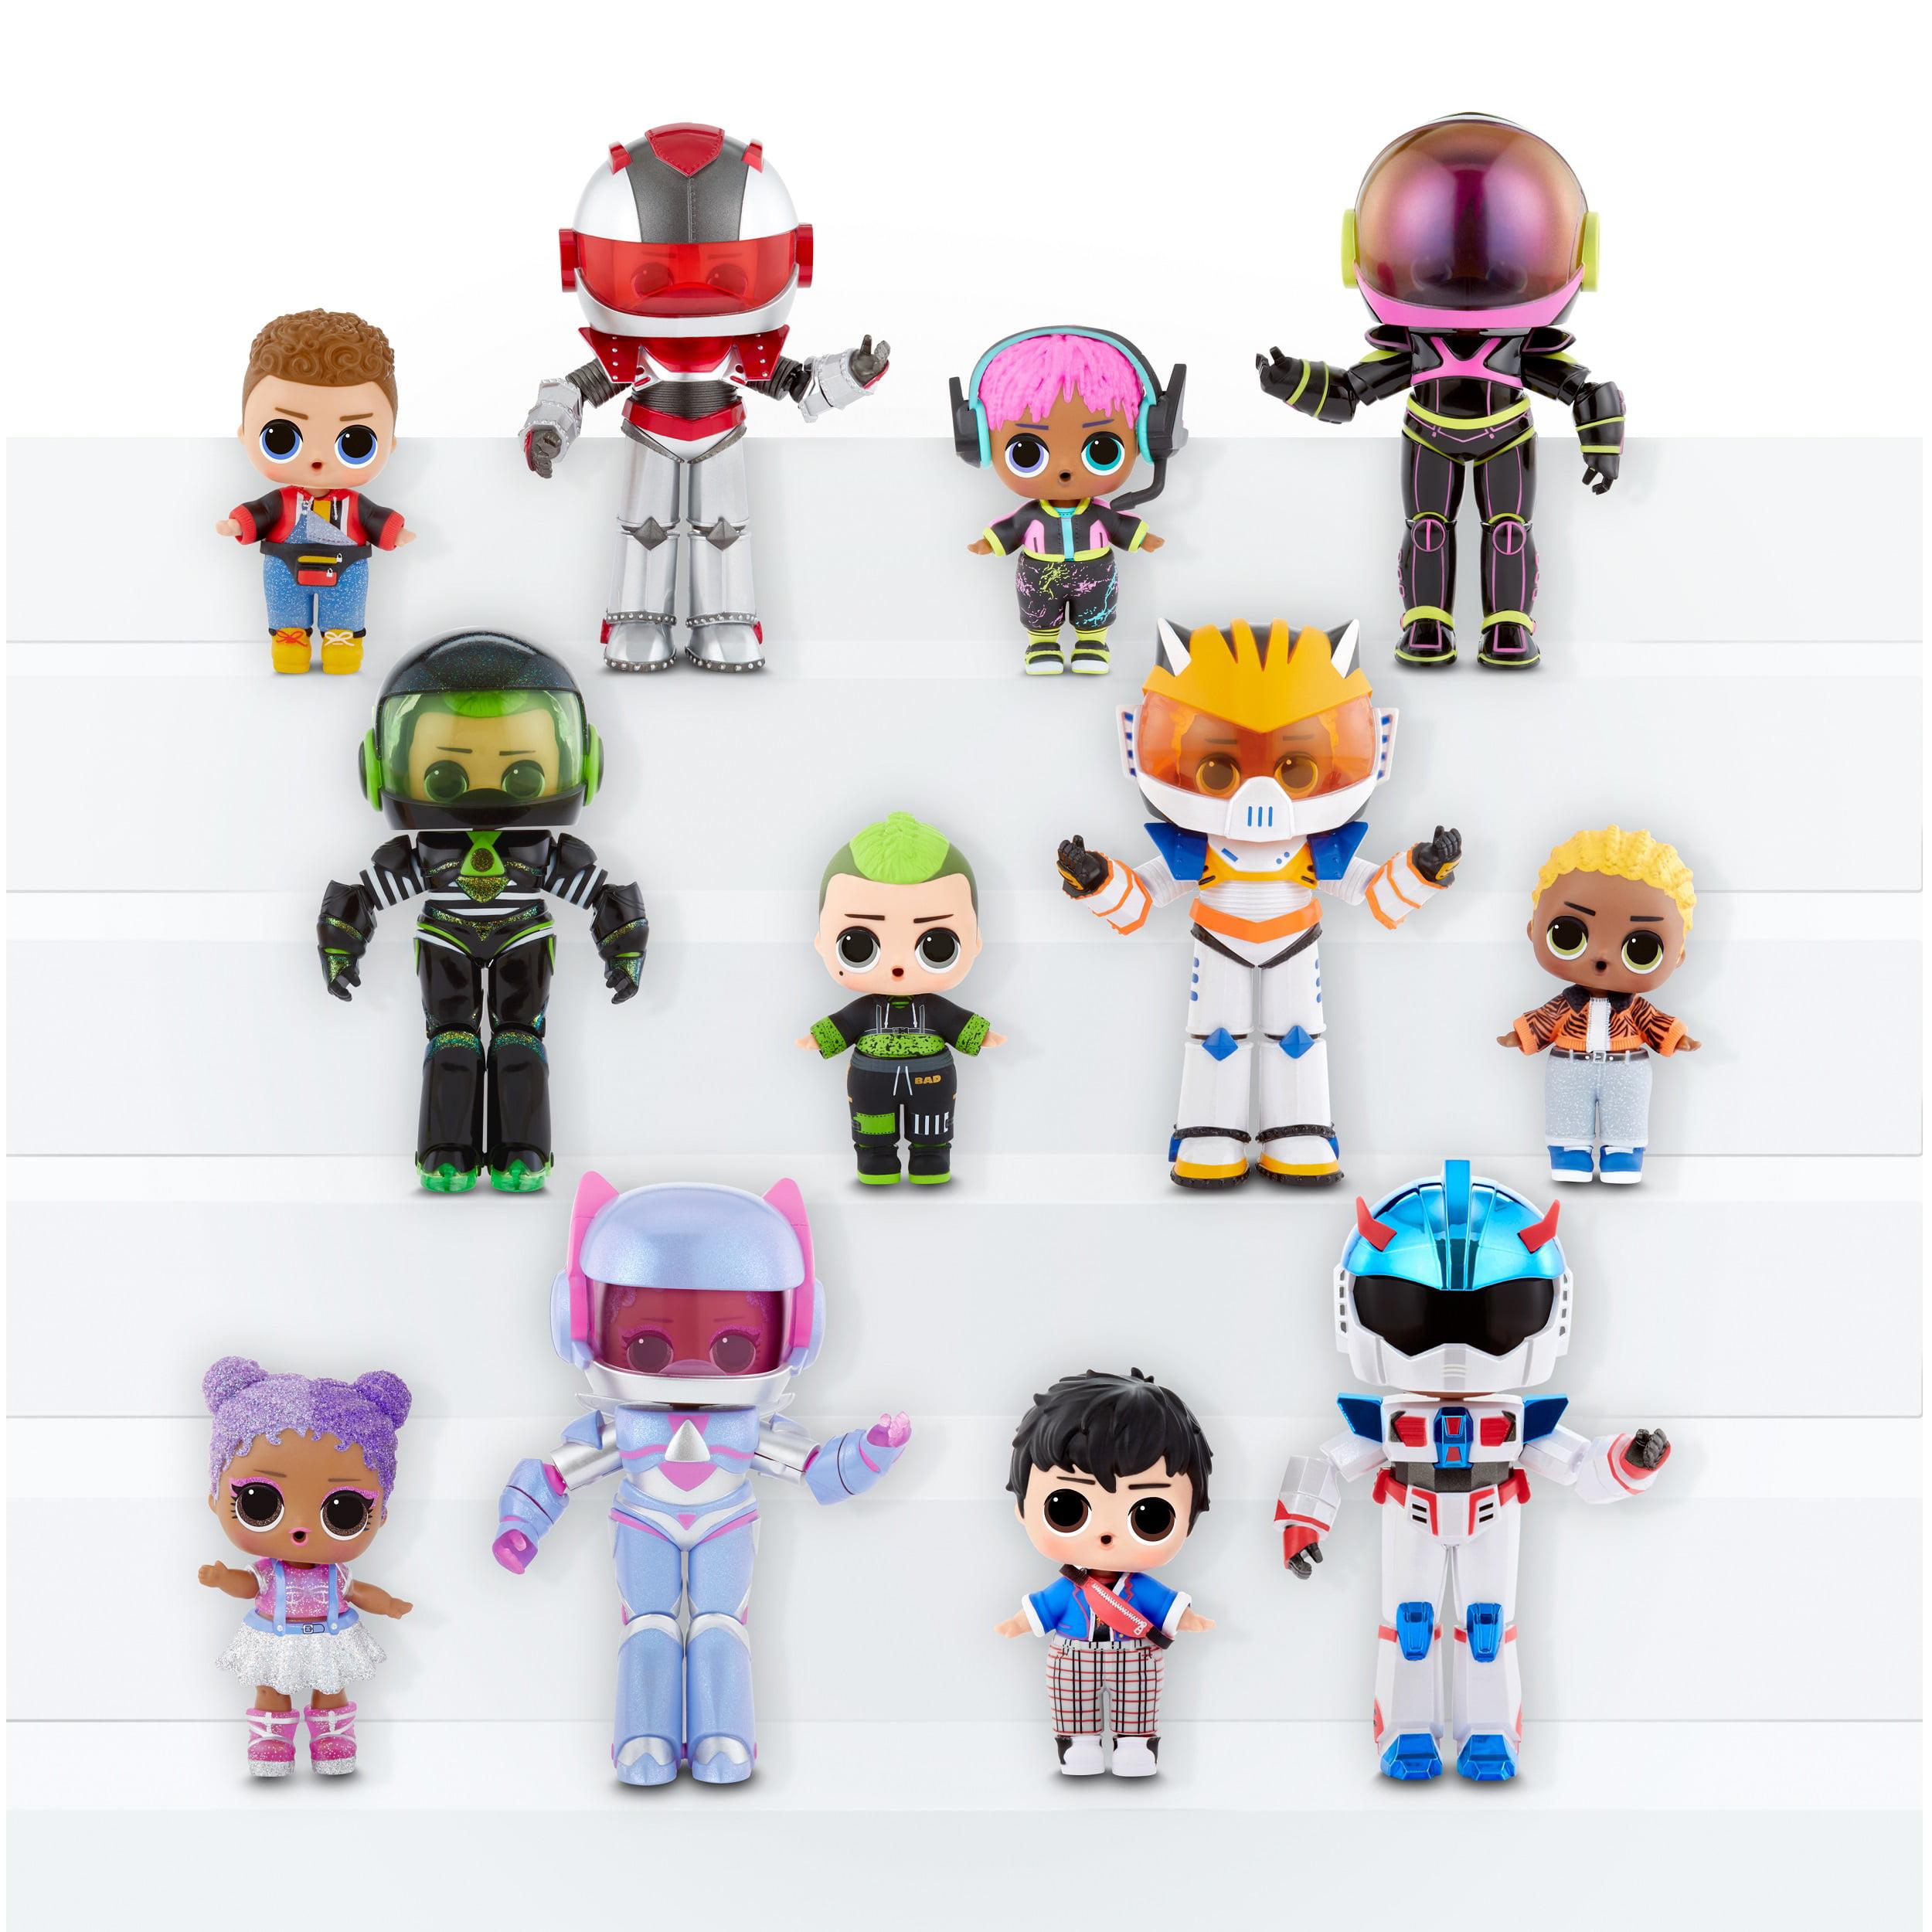 1 LOL Surprise Arcade Heroes Infinity Queen Starling Big Sister Doll /& Hero Suit